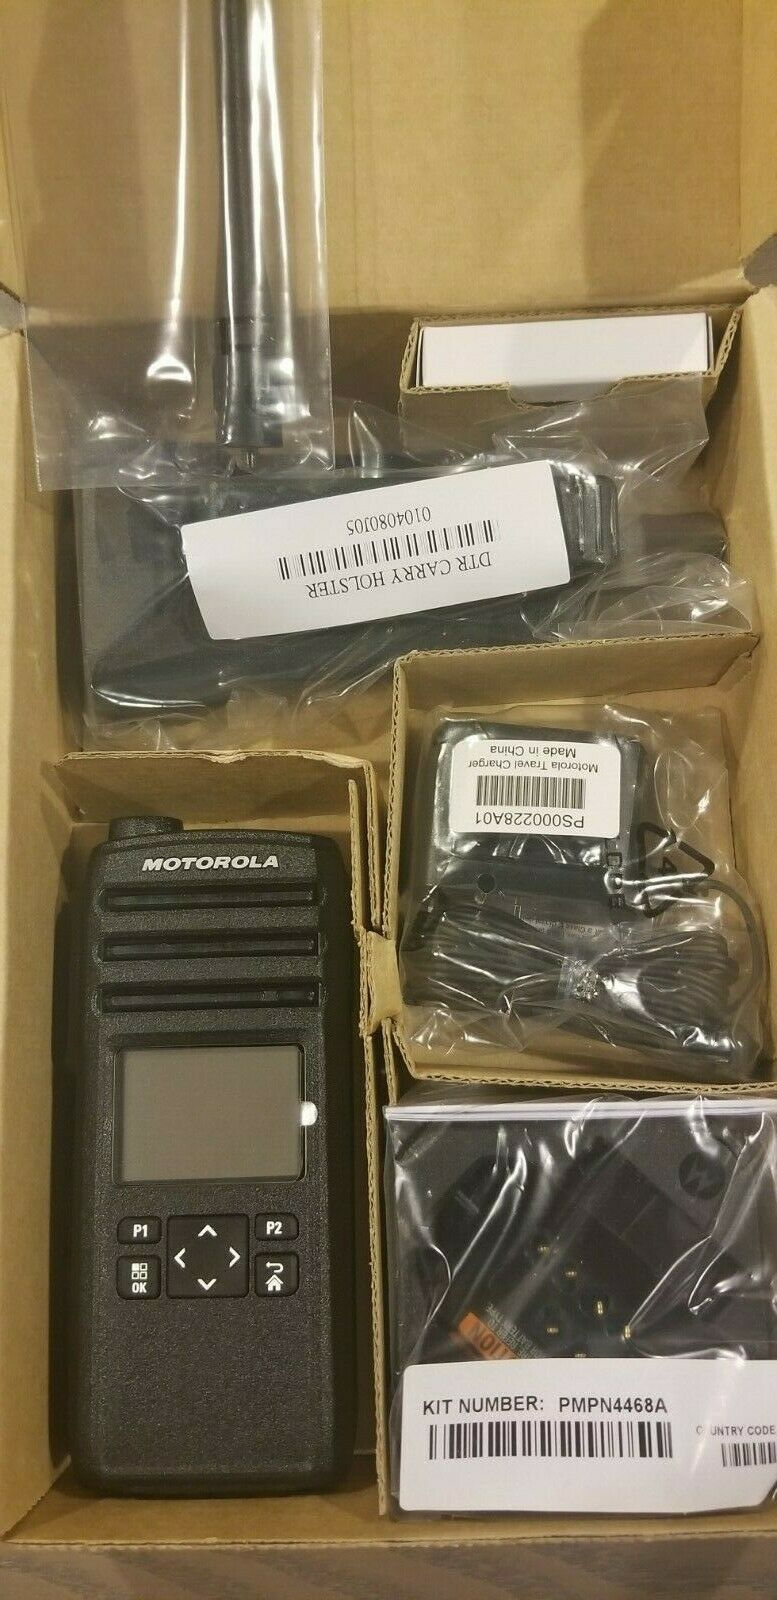 DTR 700 Motorola DTS150NBDLAA Digital Radio DMR Complete Kit **SALE PRICE**. Available Now for 239.00